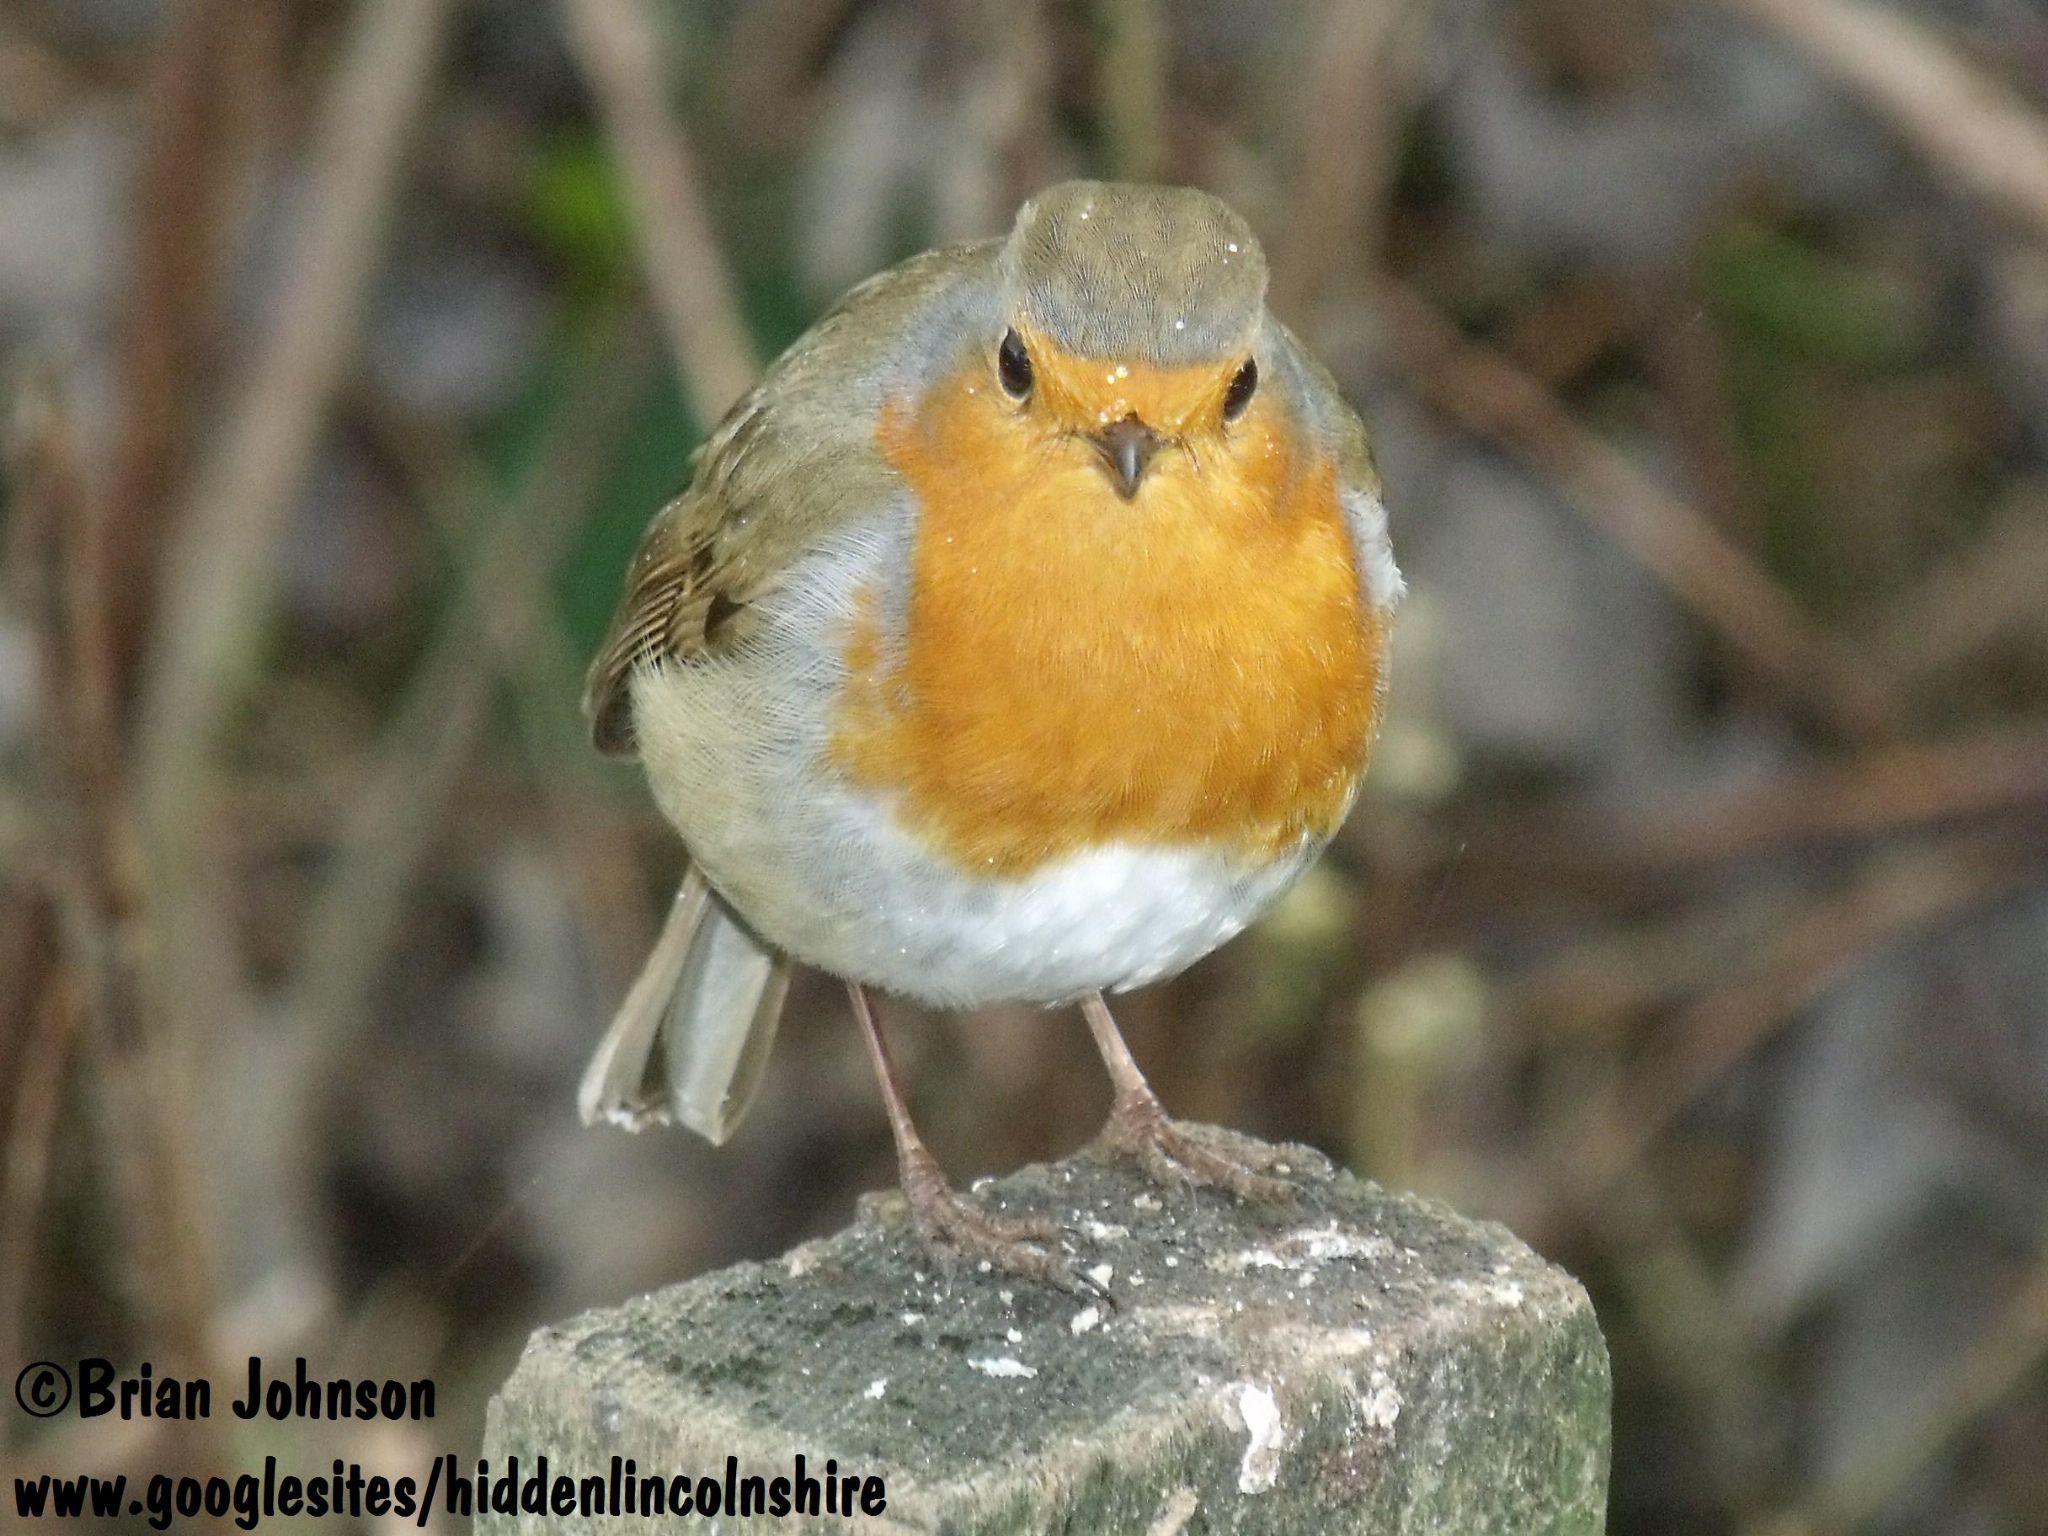 Plump little Robin in the rain. by Brian Johnson